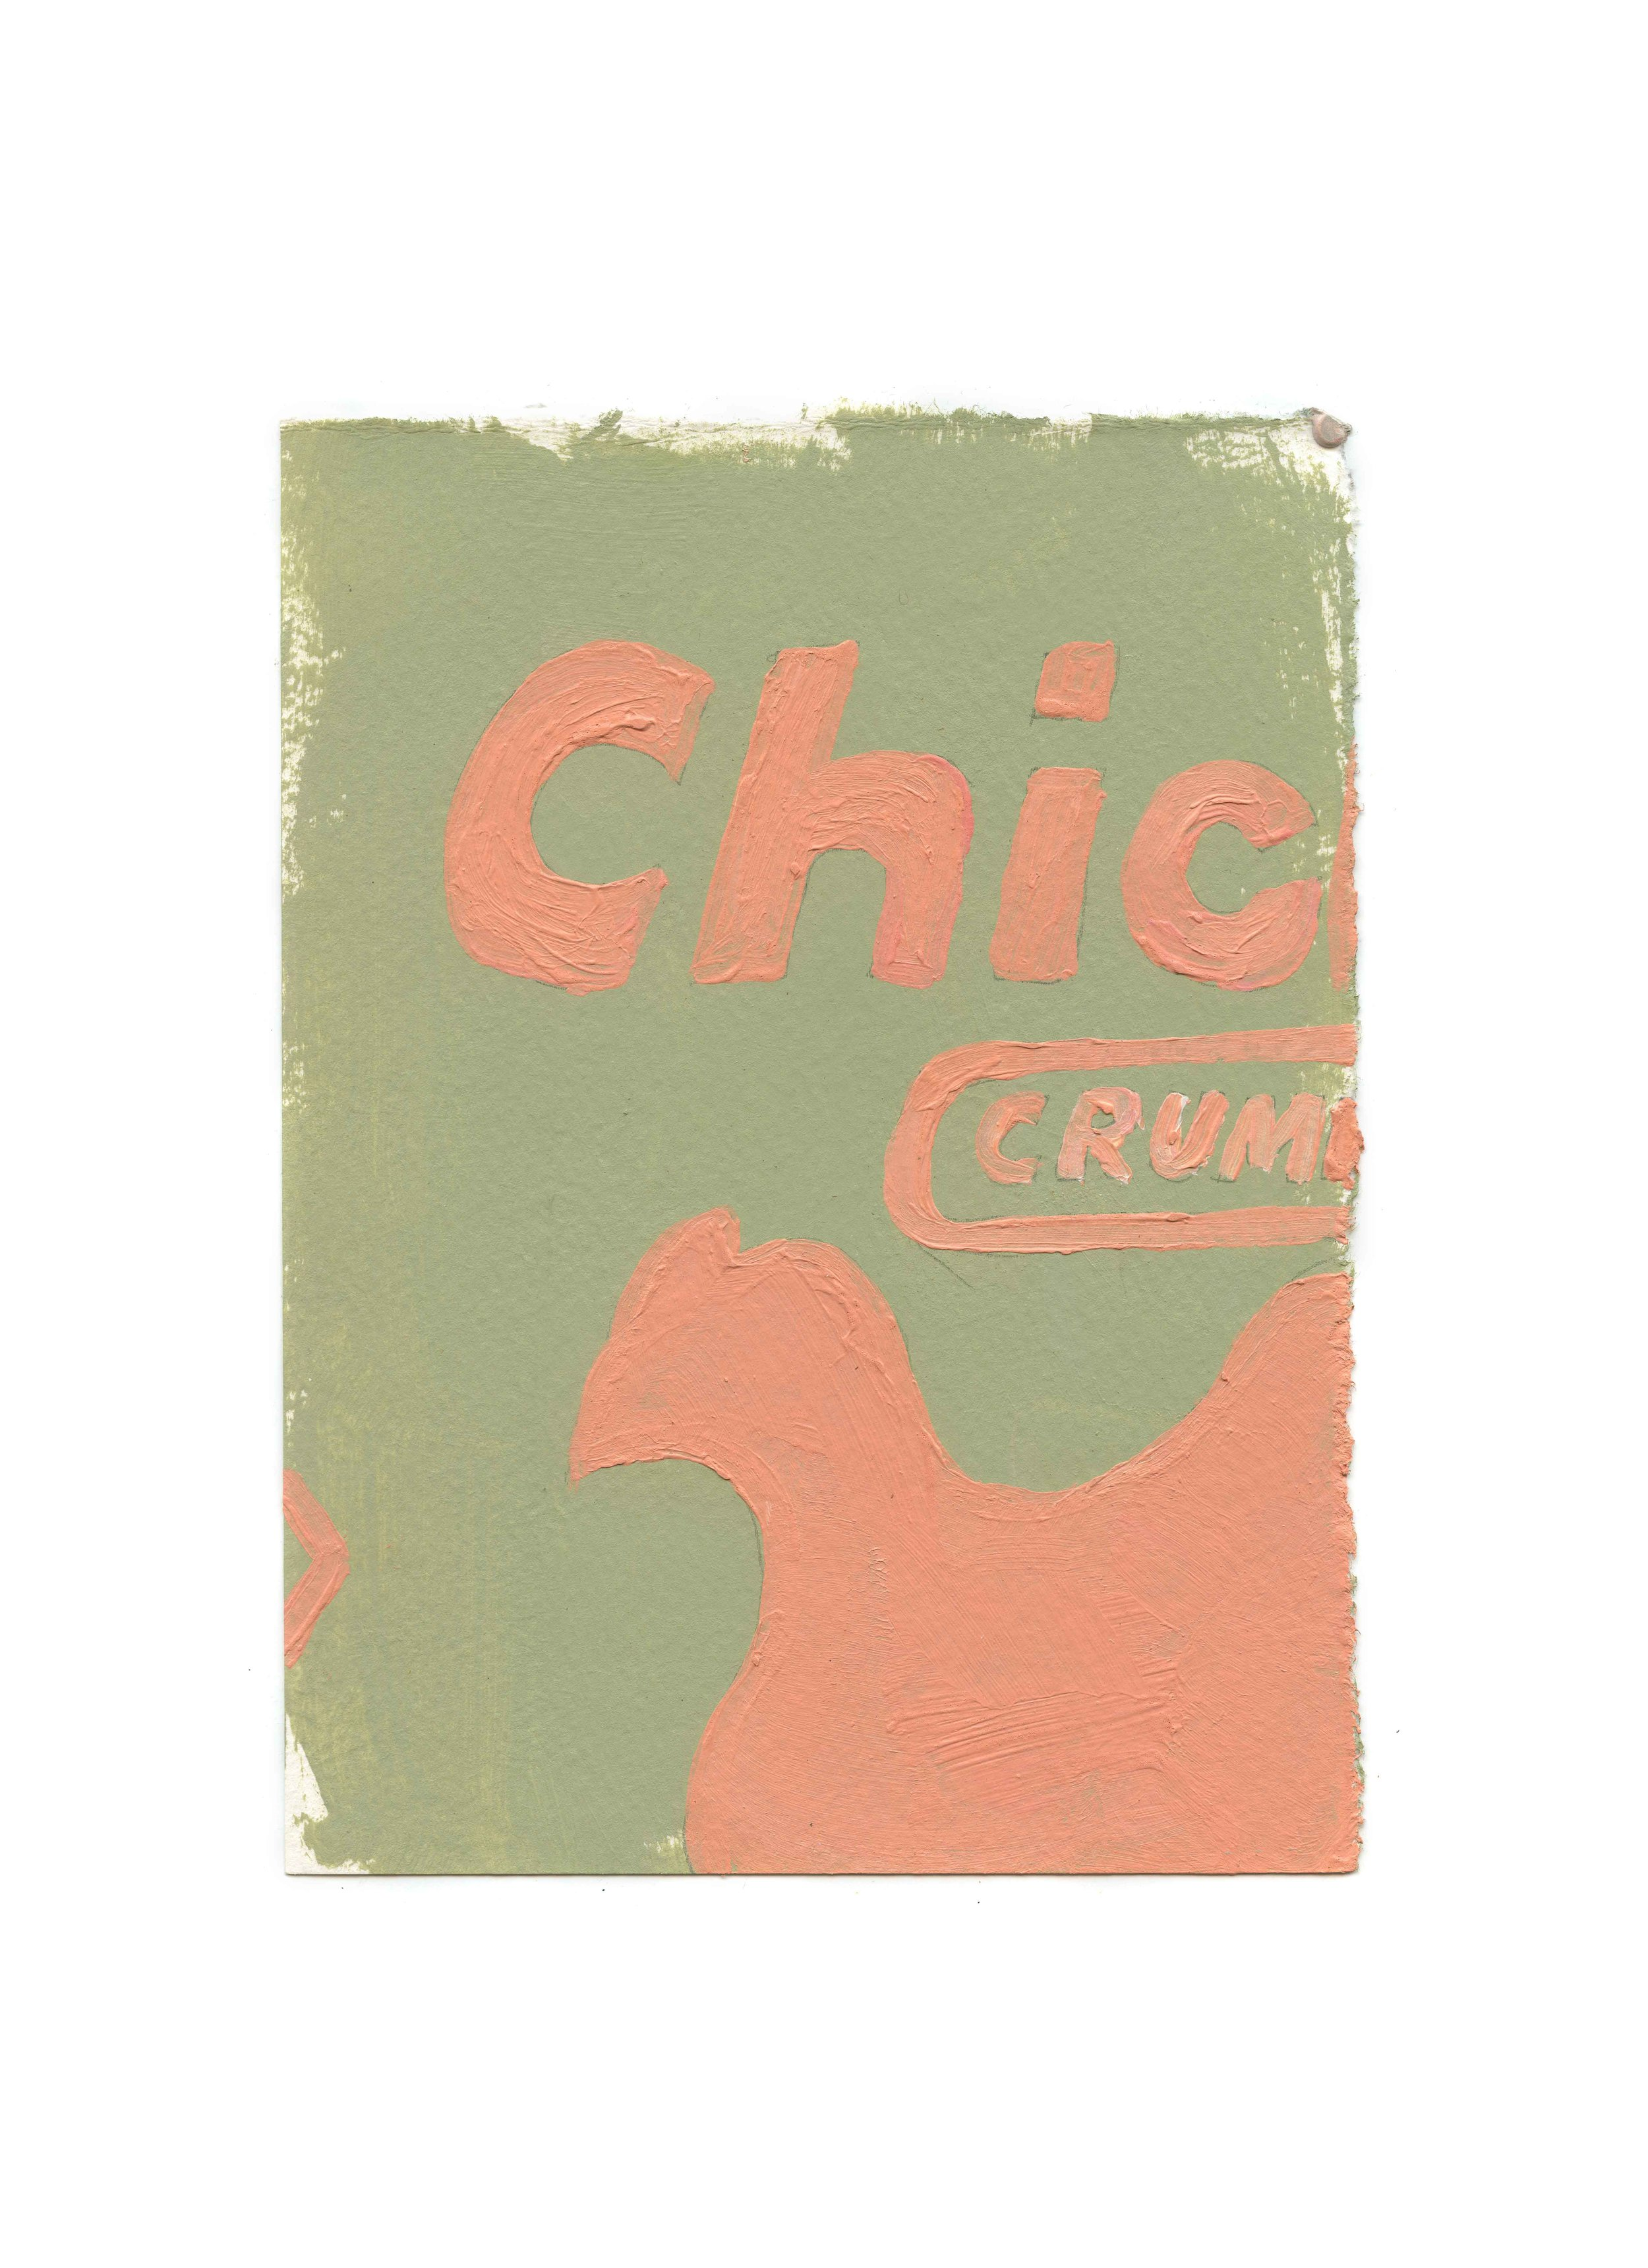 chic(ken)-WEB.jpg